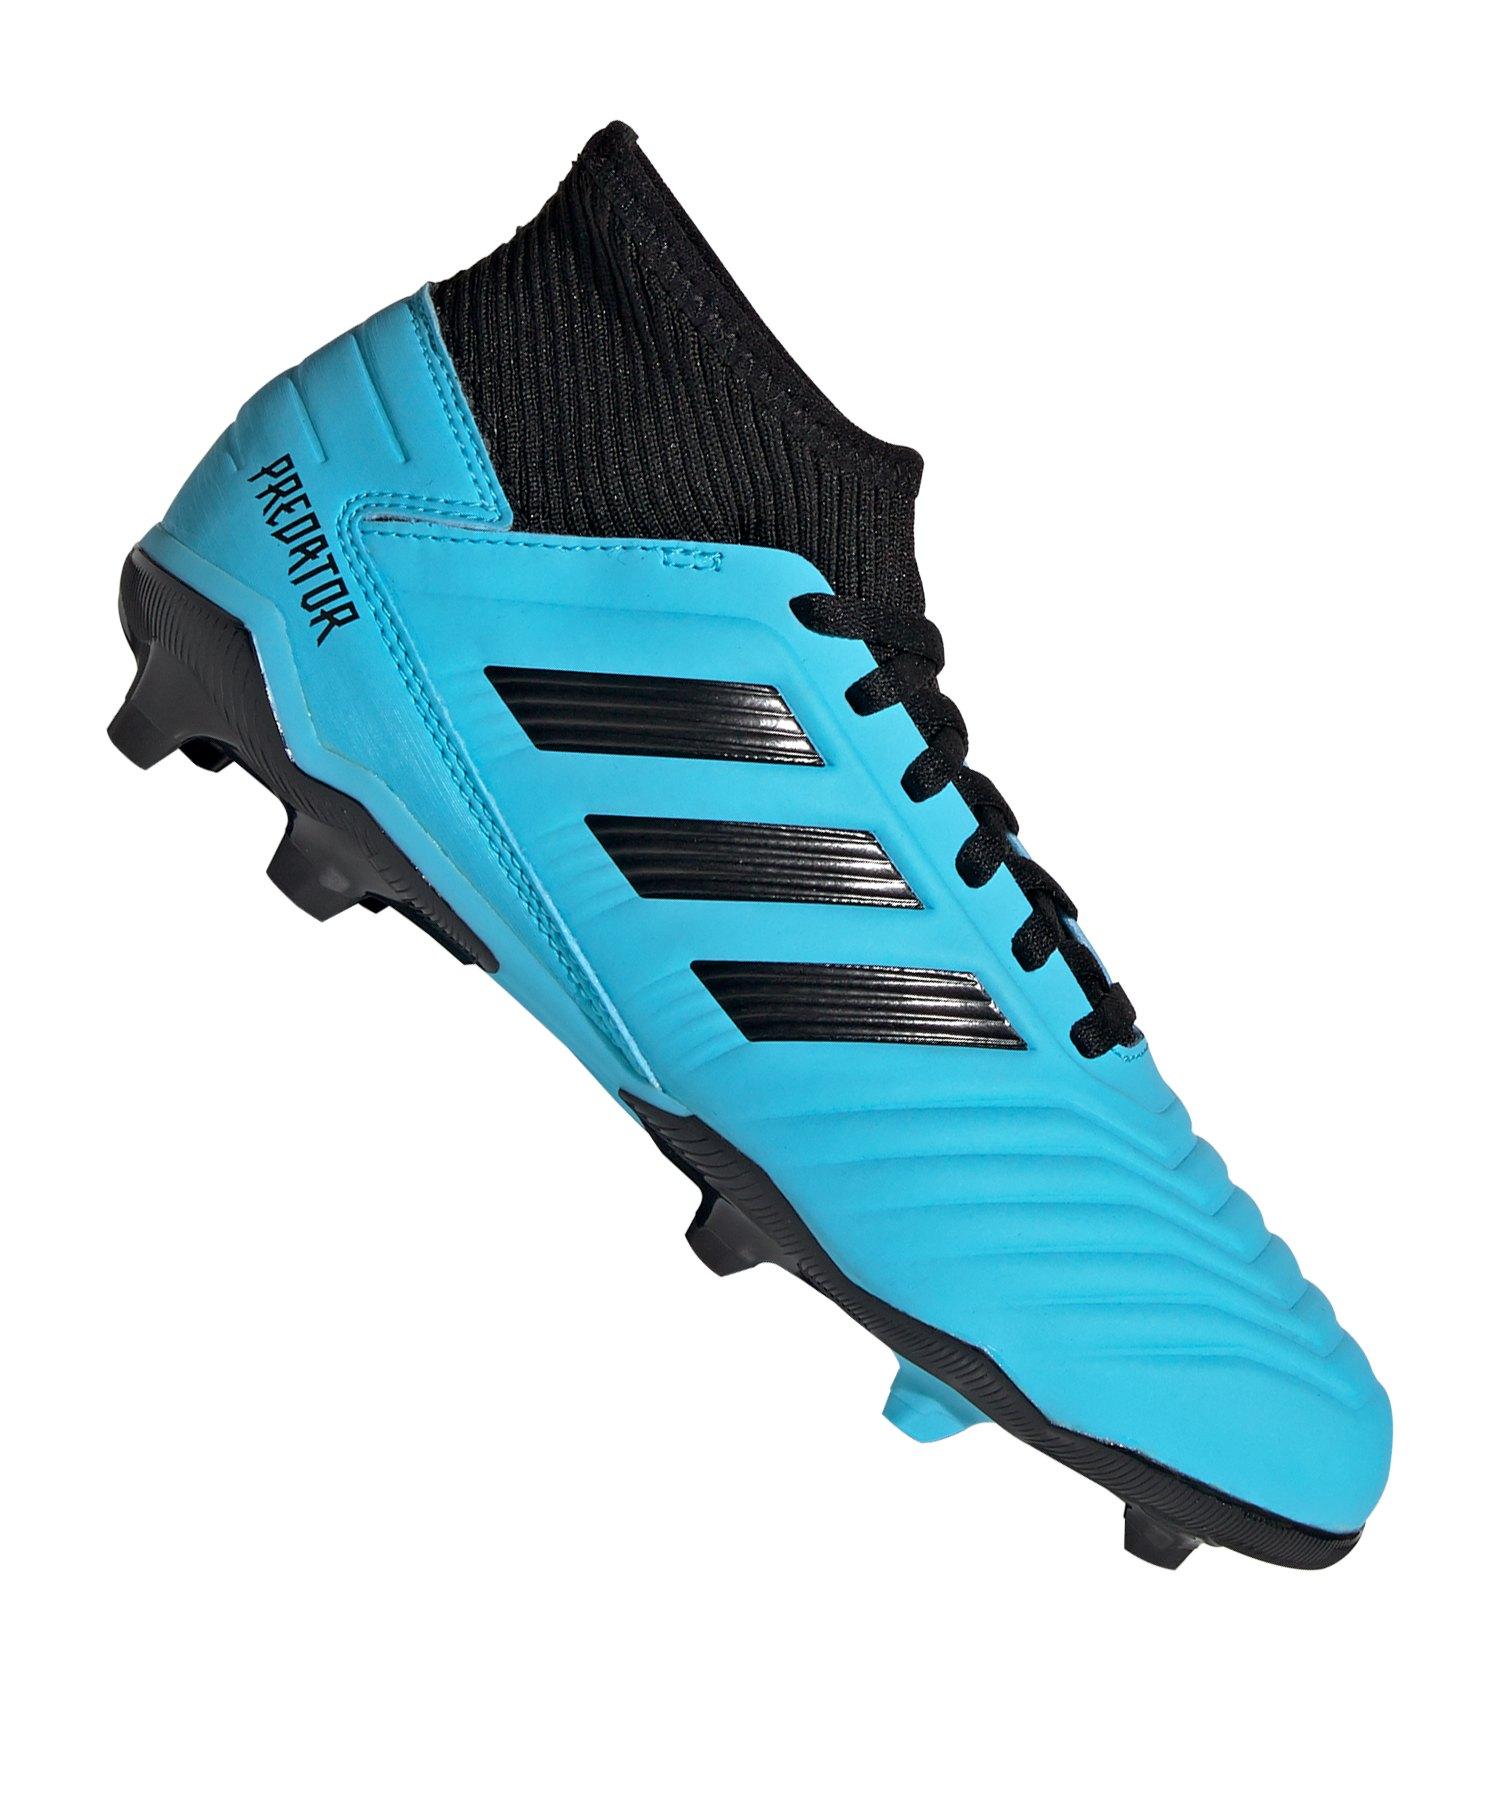 Adidas Schwarz 3 Predator J Blau Kids Fg 19 T3FclKJ1